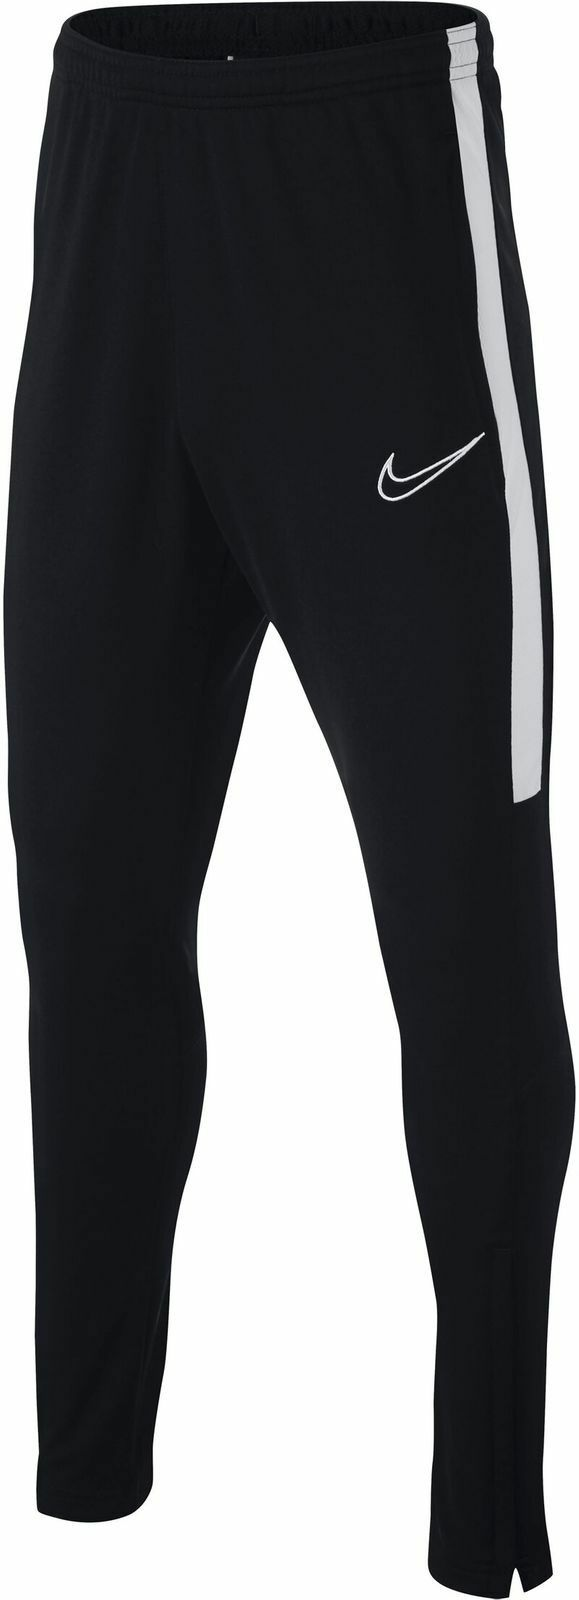 ee9d355a02a468 Nike Kinder Trainingshose Fußballhose B NK DRY ACADEMY PANT schwarz   weiß